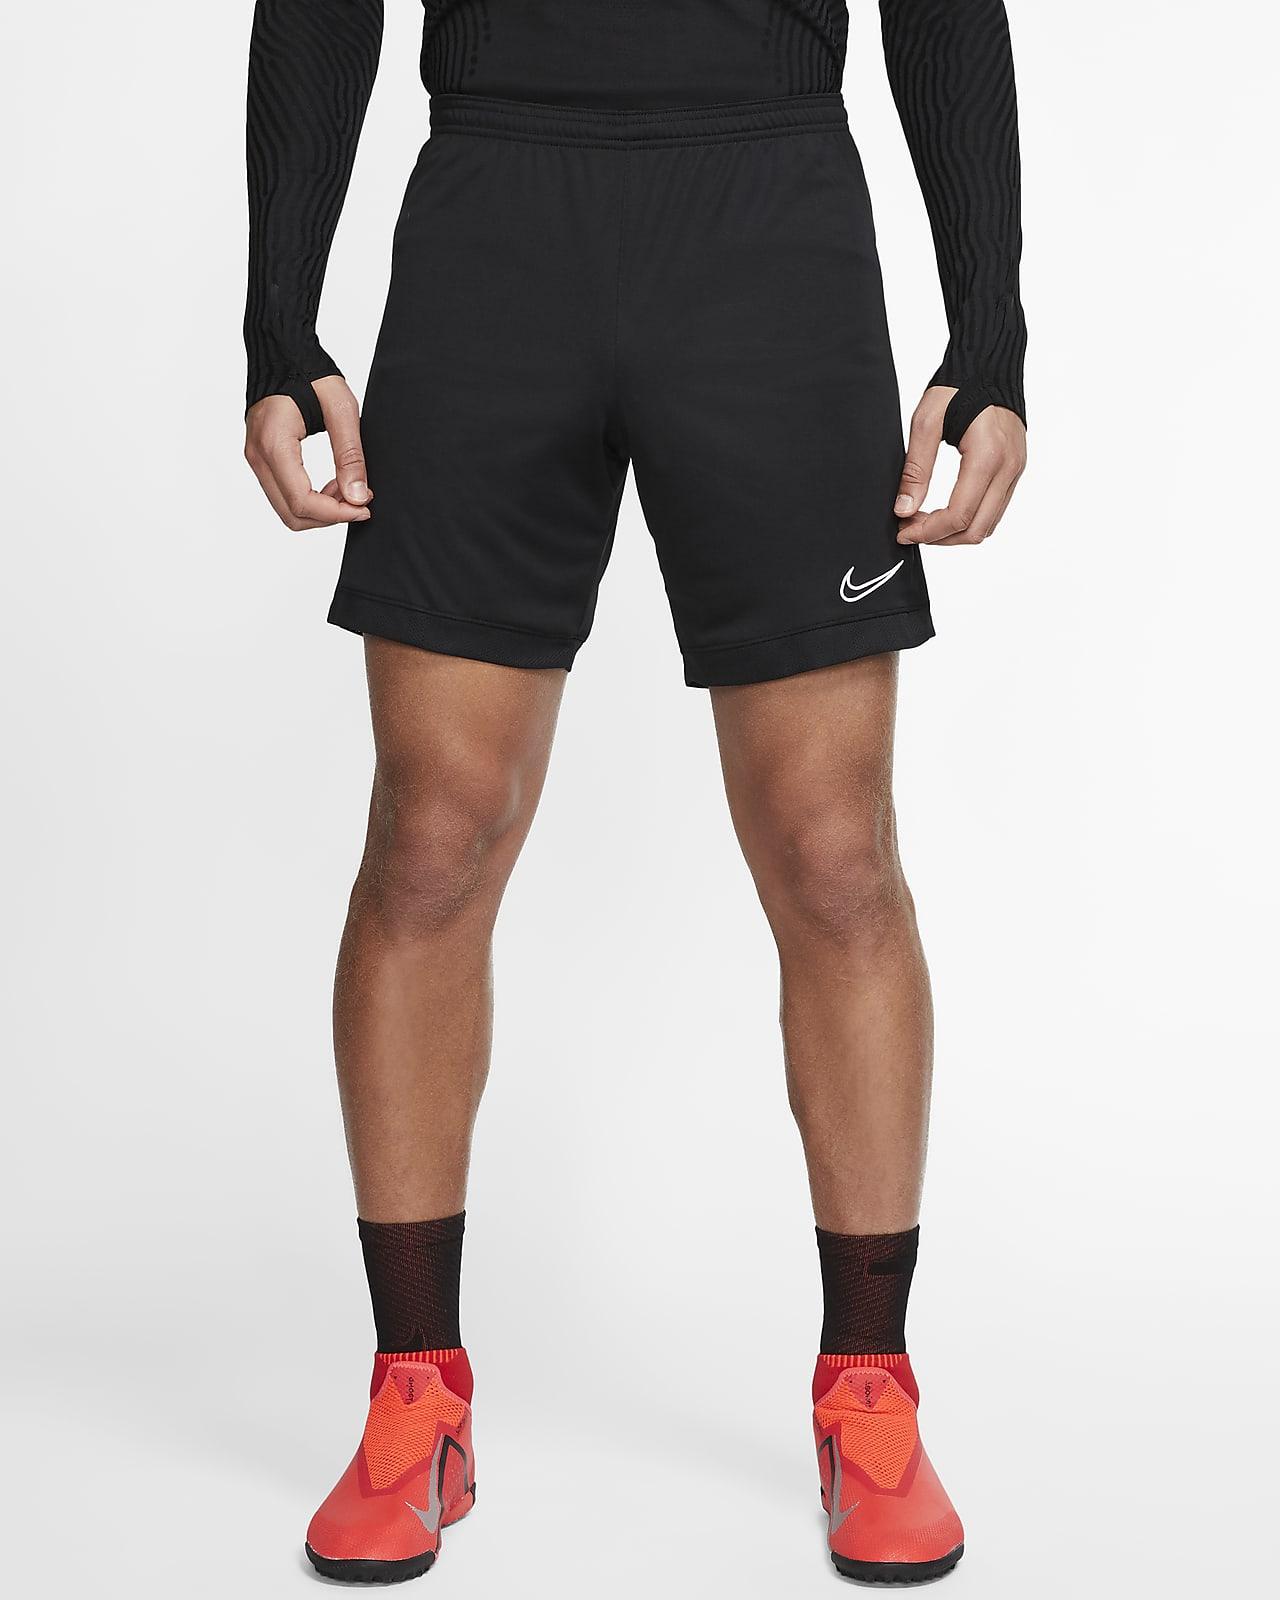 Nike Dri Fit Academy Pantalon Corto De Futbol Hombre Nike Es